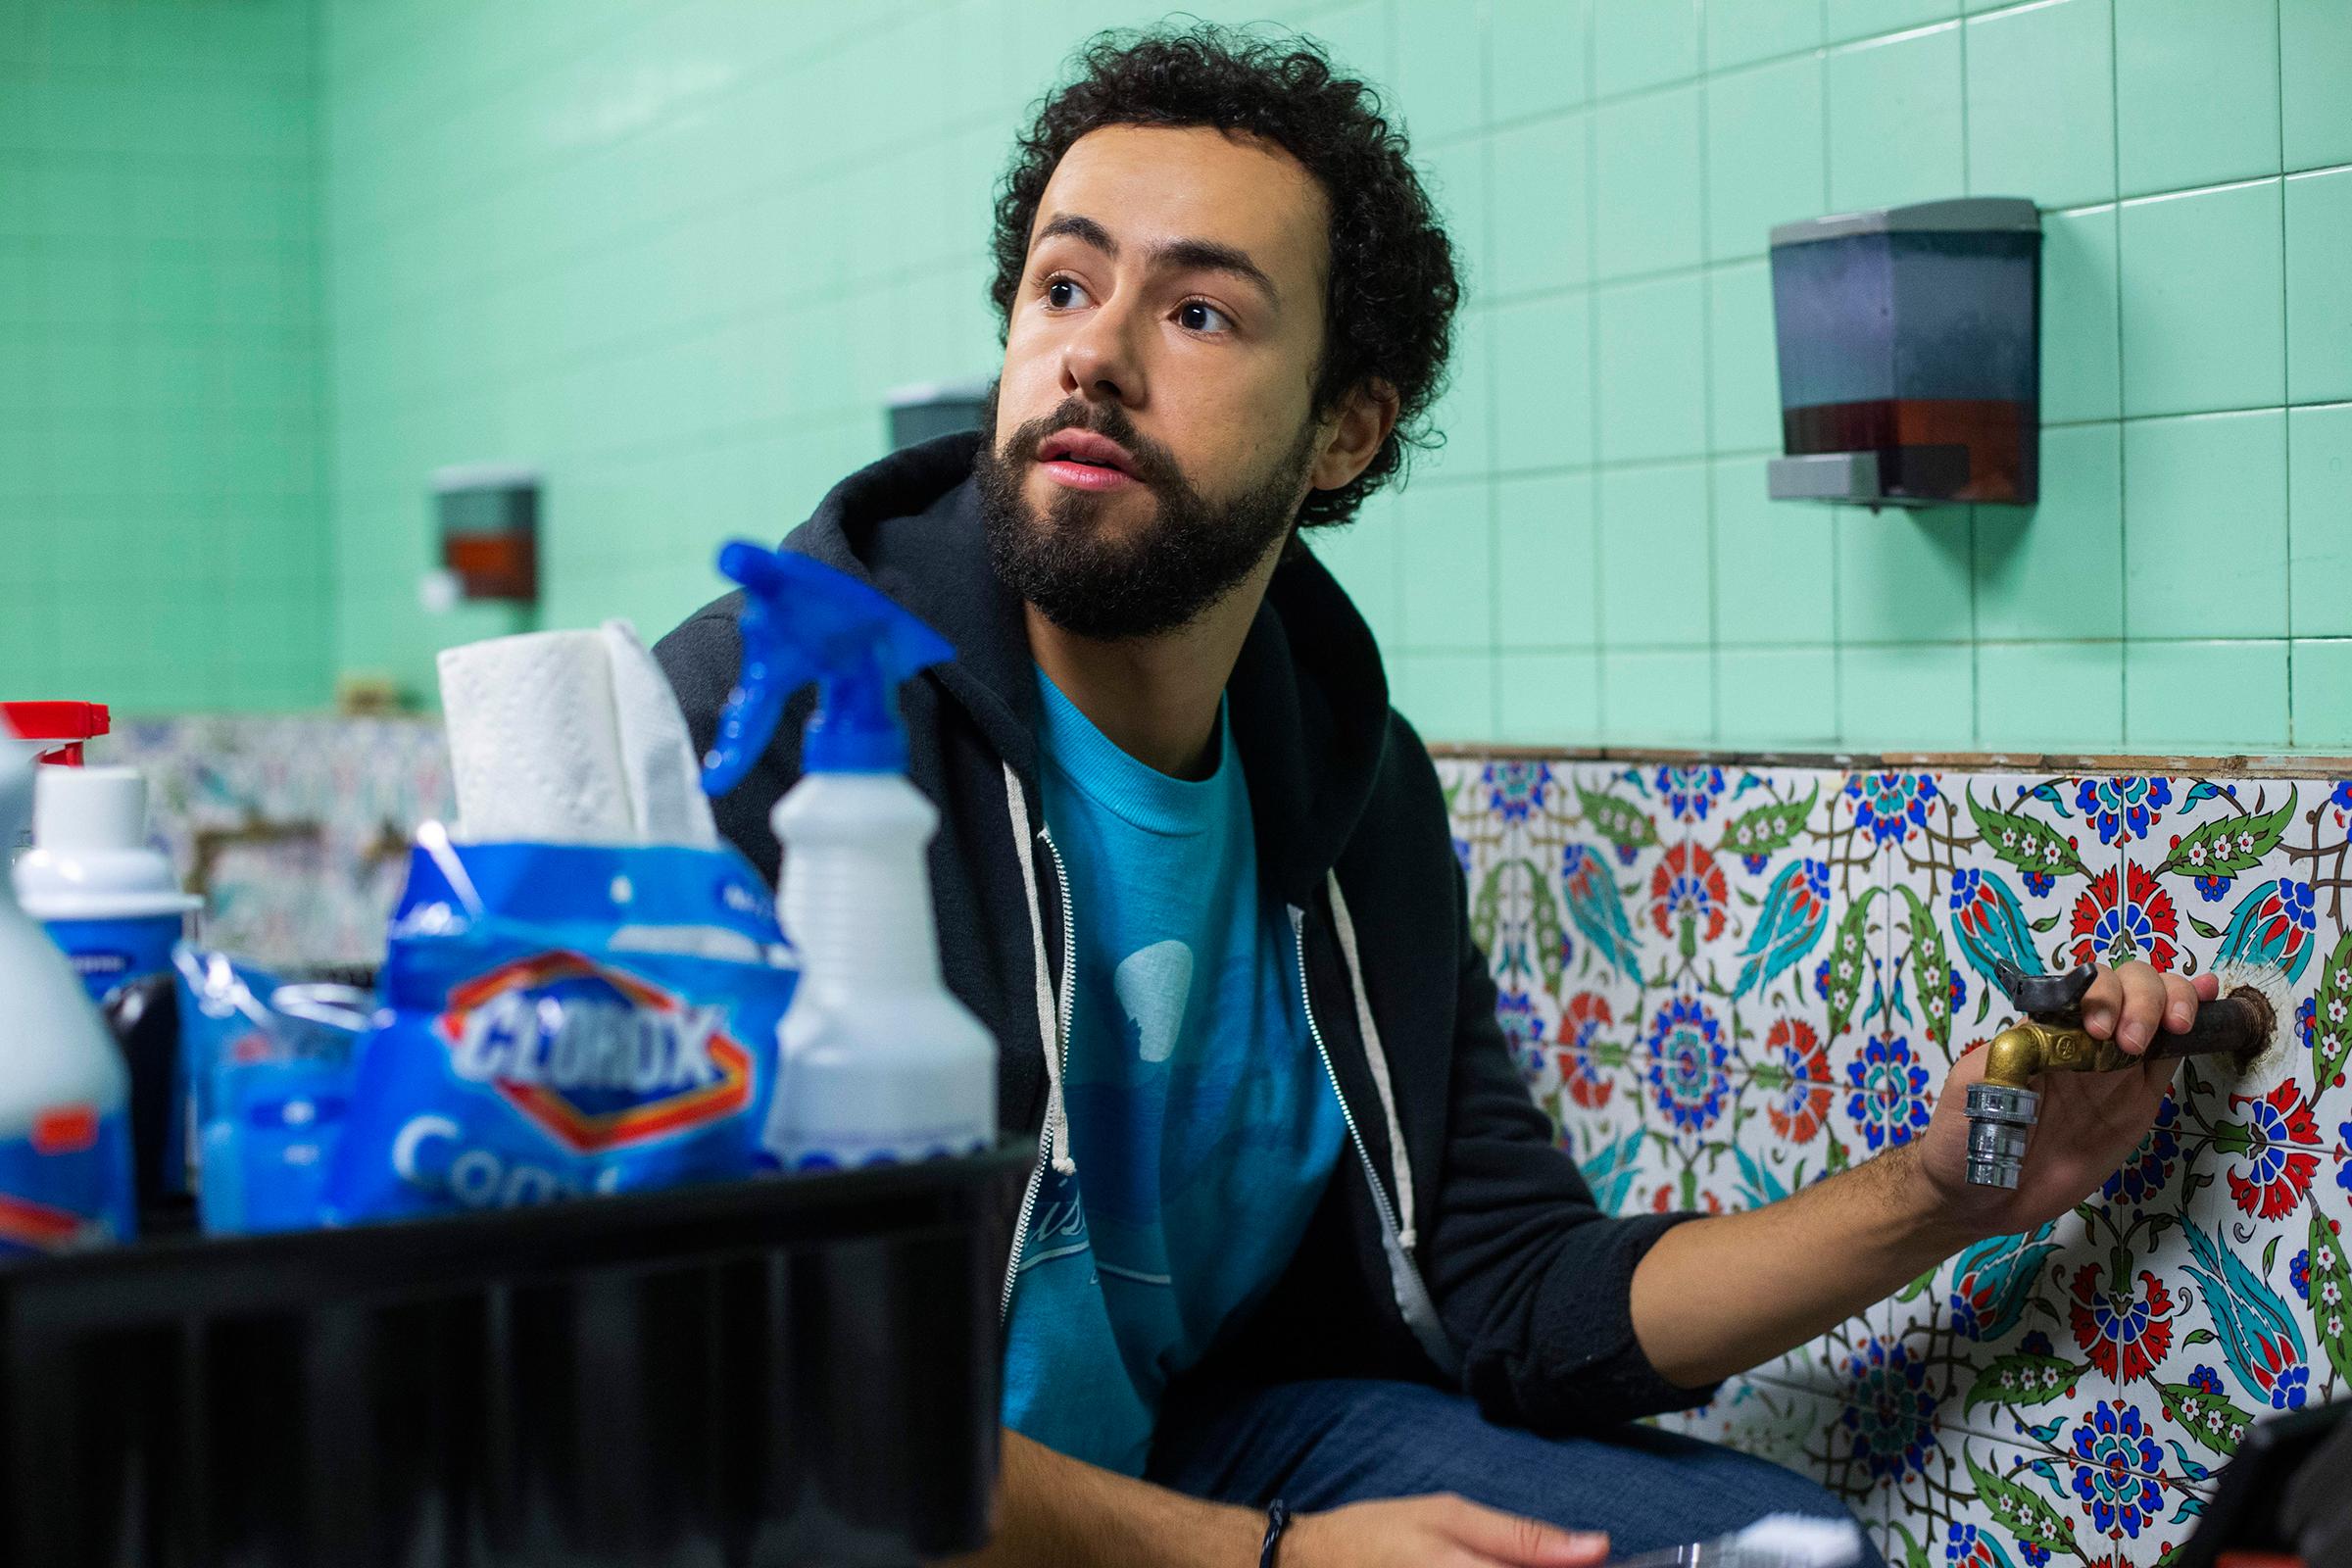 Best Movies and TV to Stream in April: 'Ramy,' Jordan Peele's 'Twilight Zone'